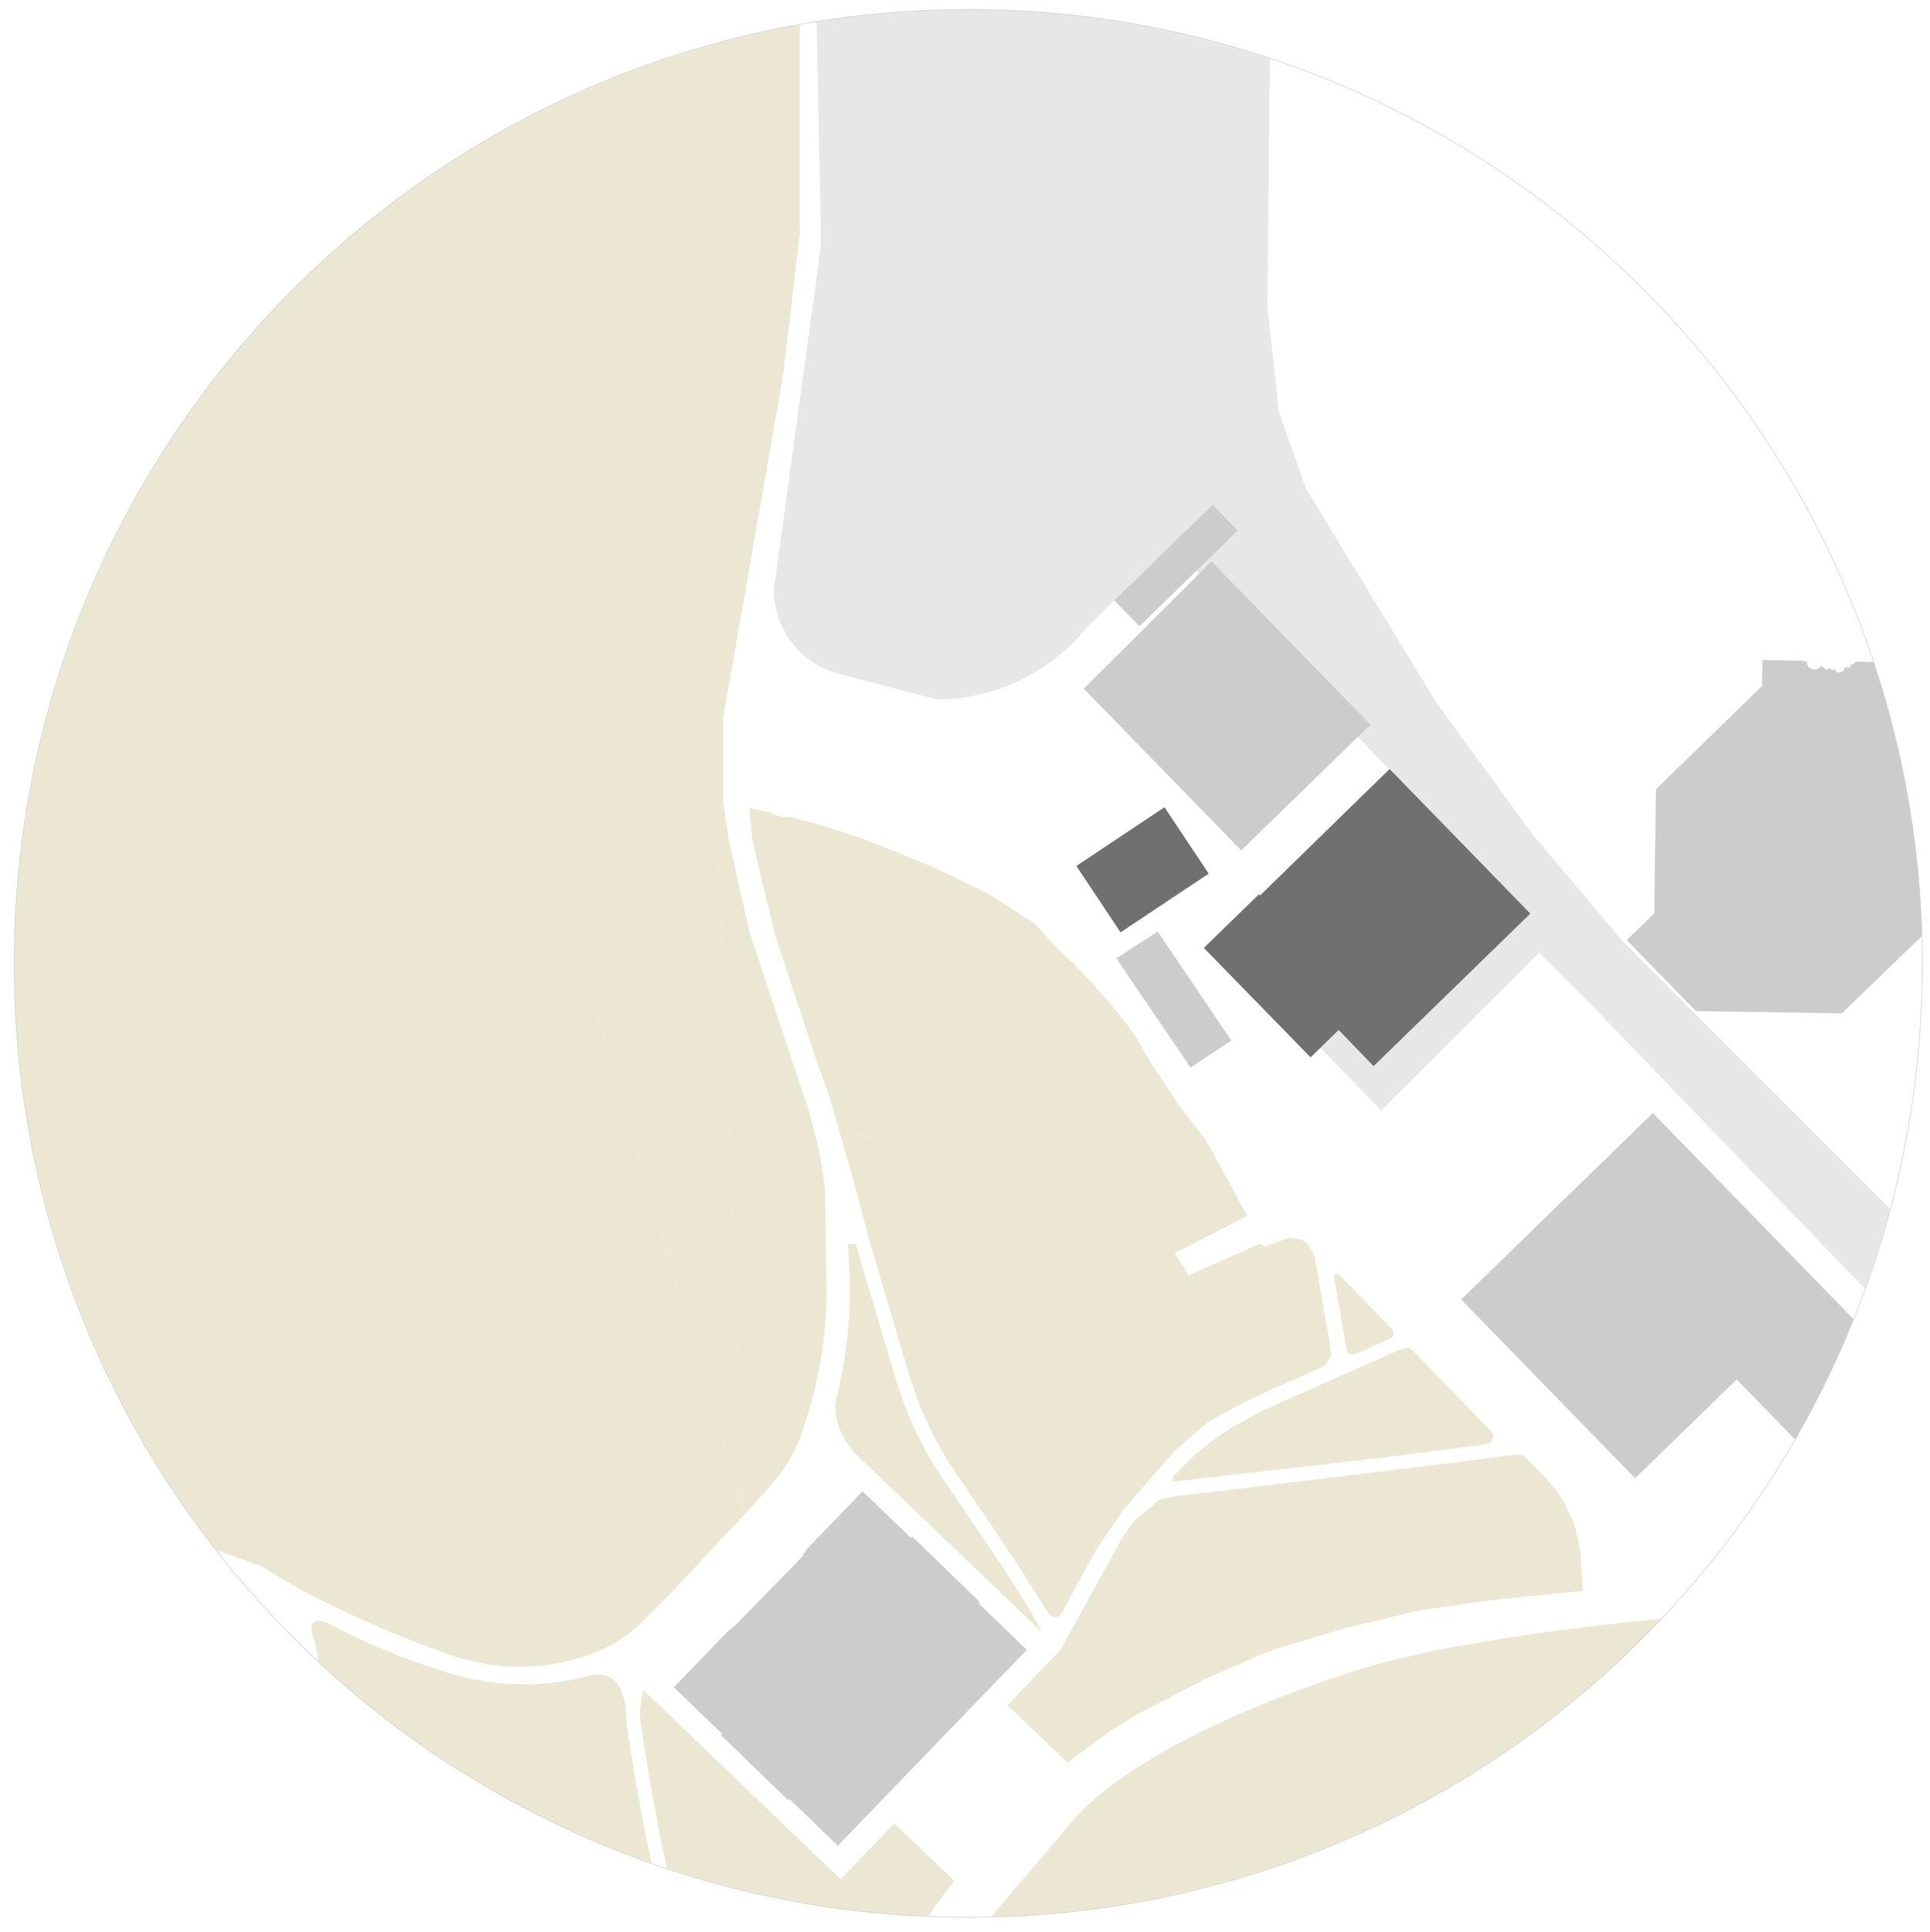 fletcher crane architects, claremont fan court school